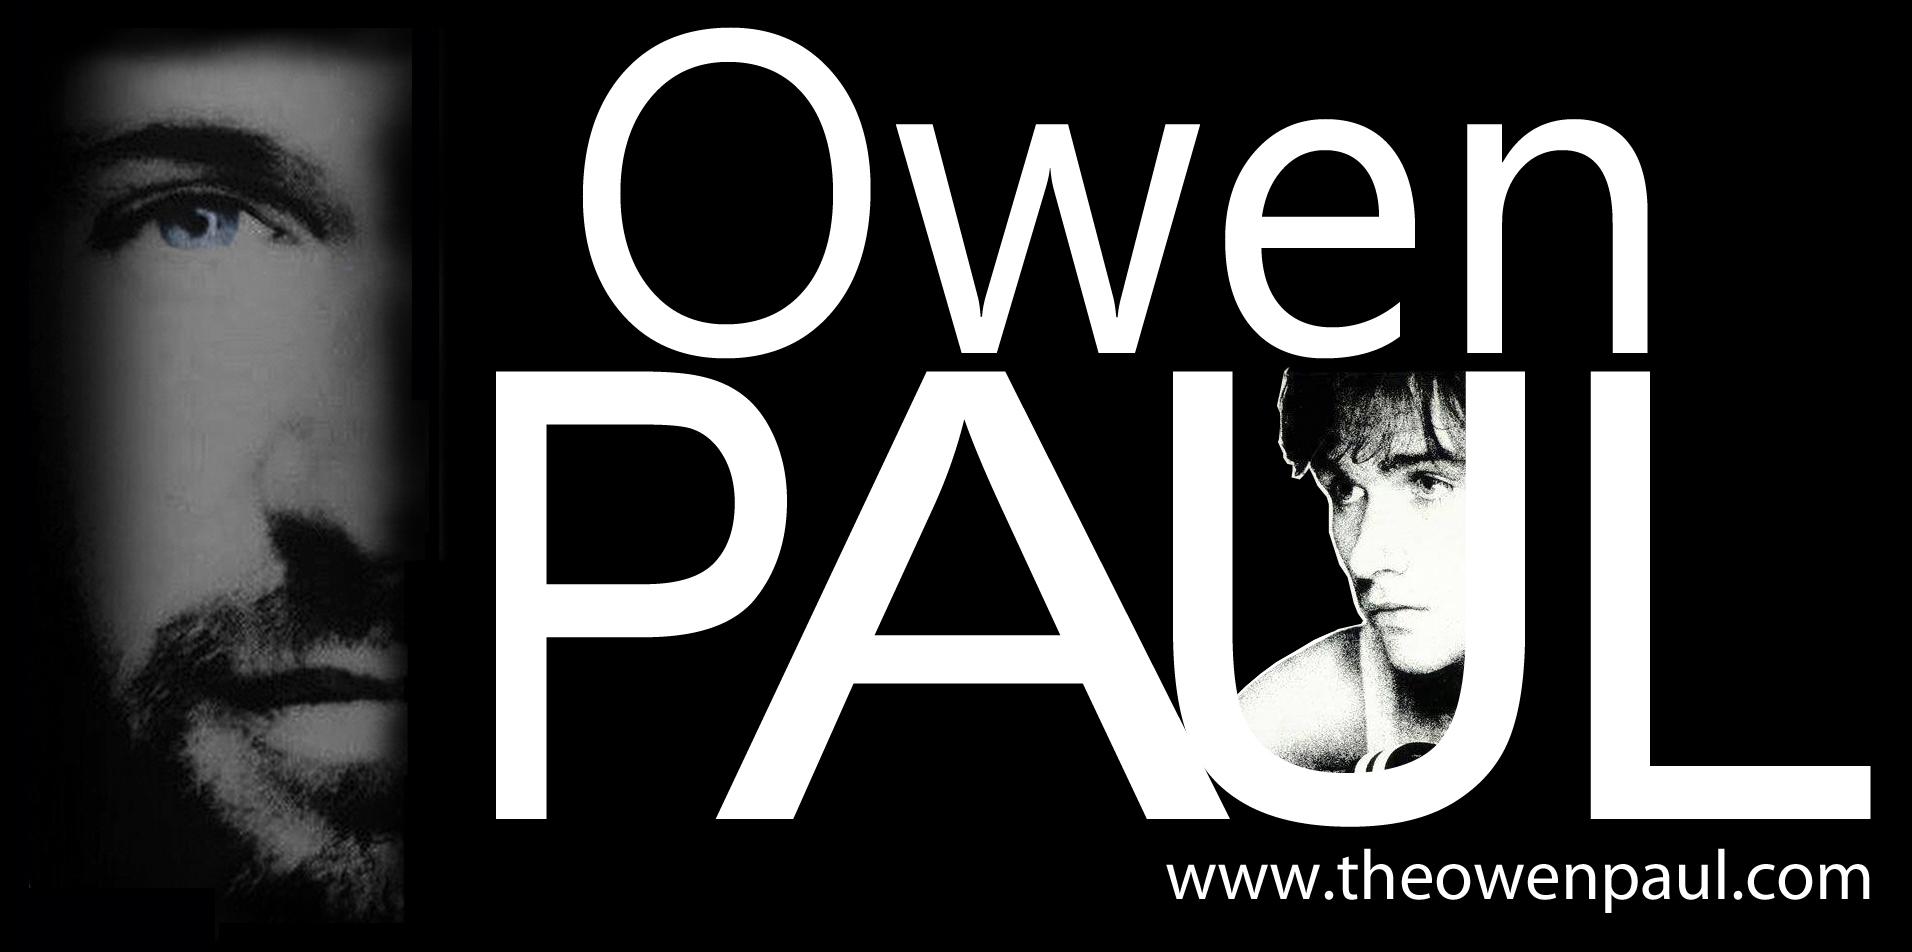 Owen Paul2 xsp.co.uk.jpg